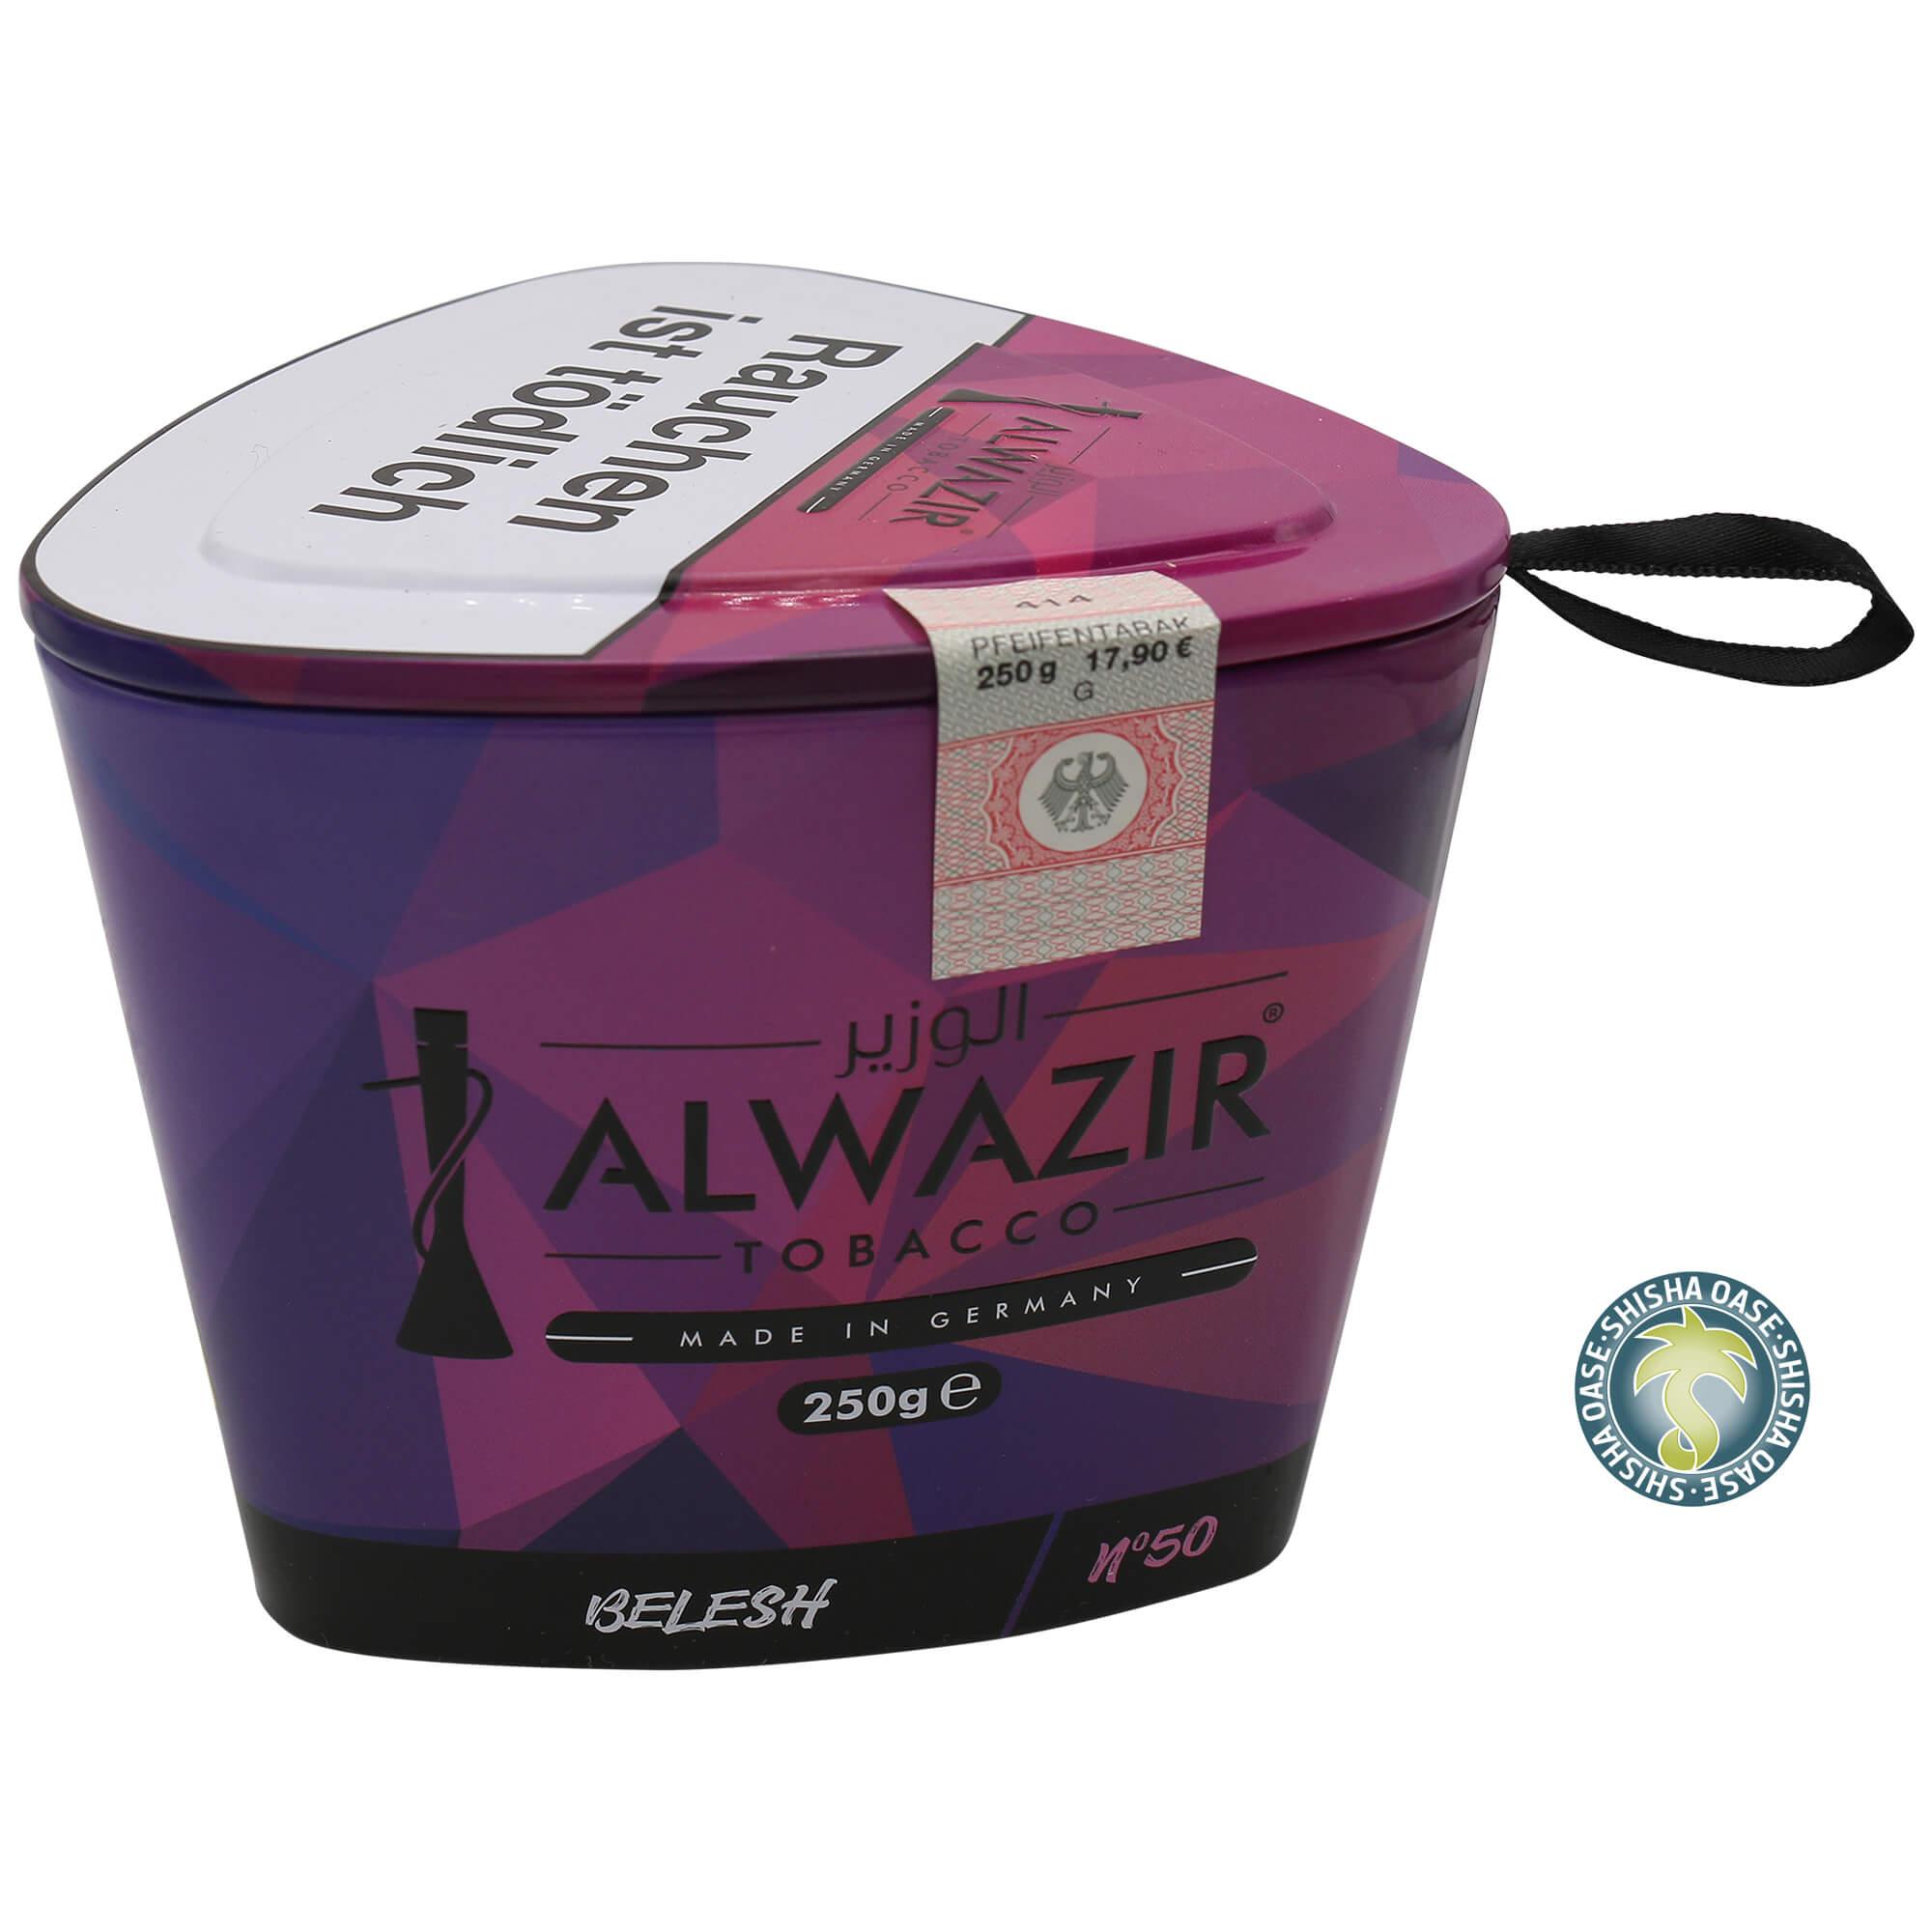 Al Wazir Tabak 250g Dose - Belesh No.50